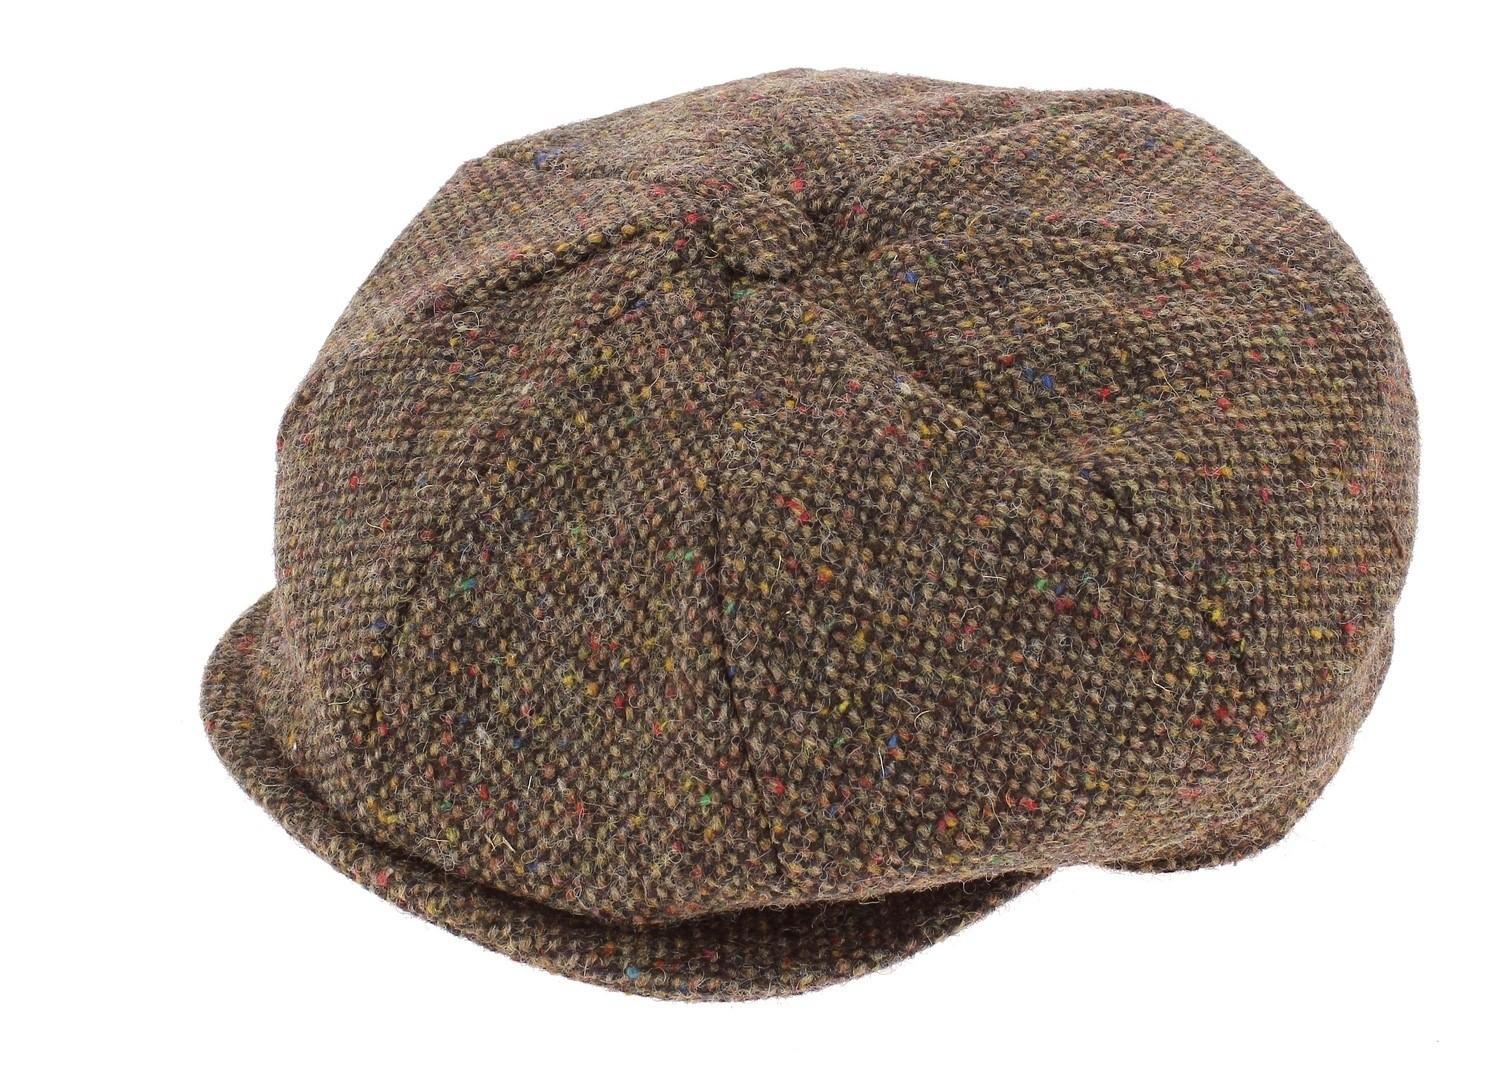 https   www.chapellerie-traclet.com en felt-hats 6594-elkader-trilby ... fc2866ebd1aa